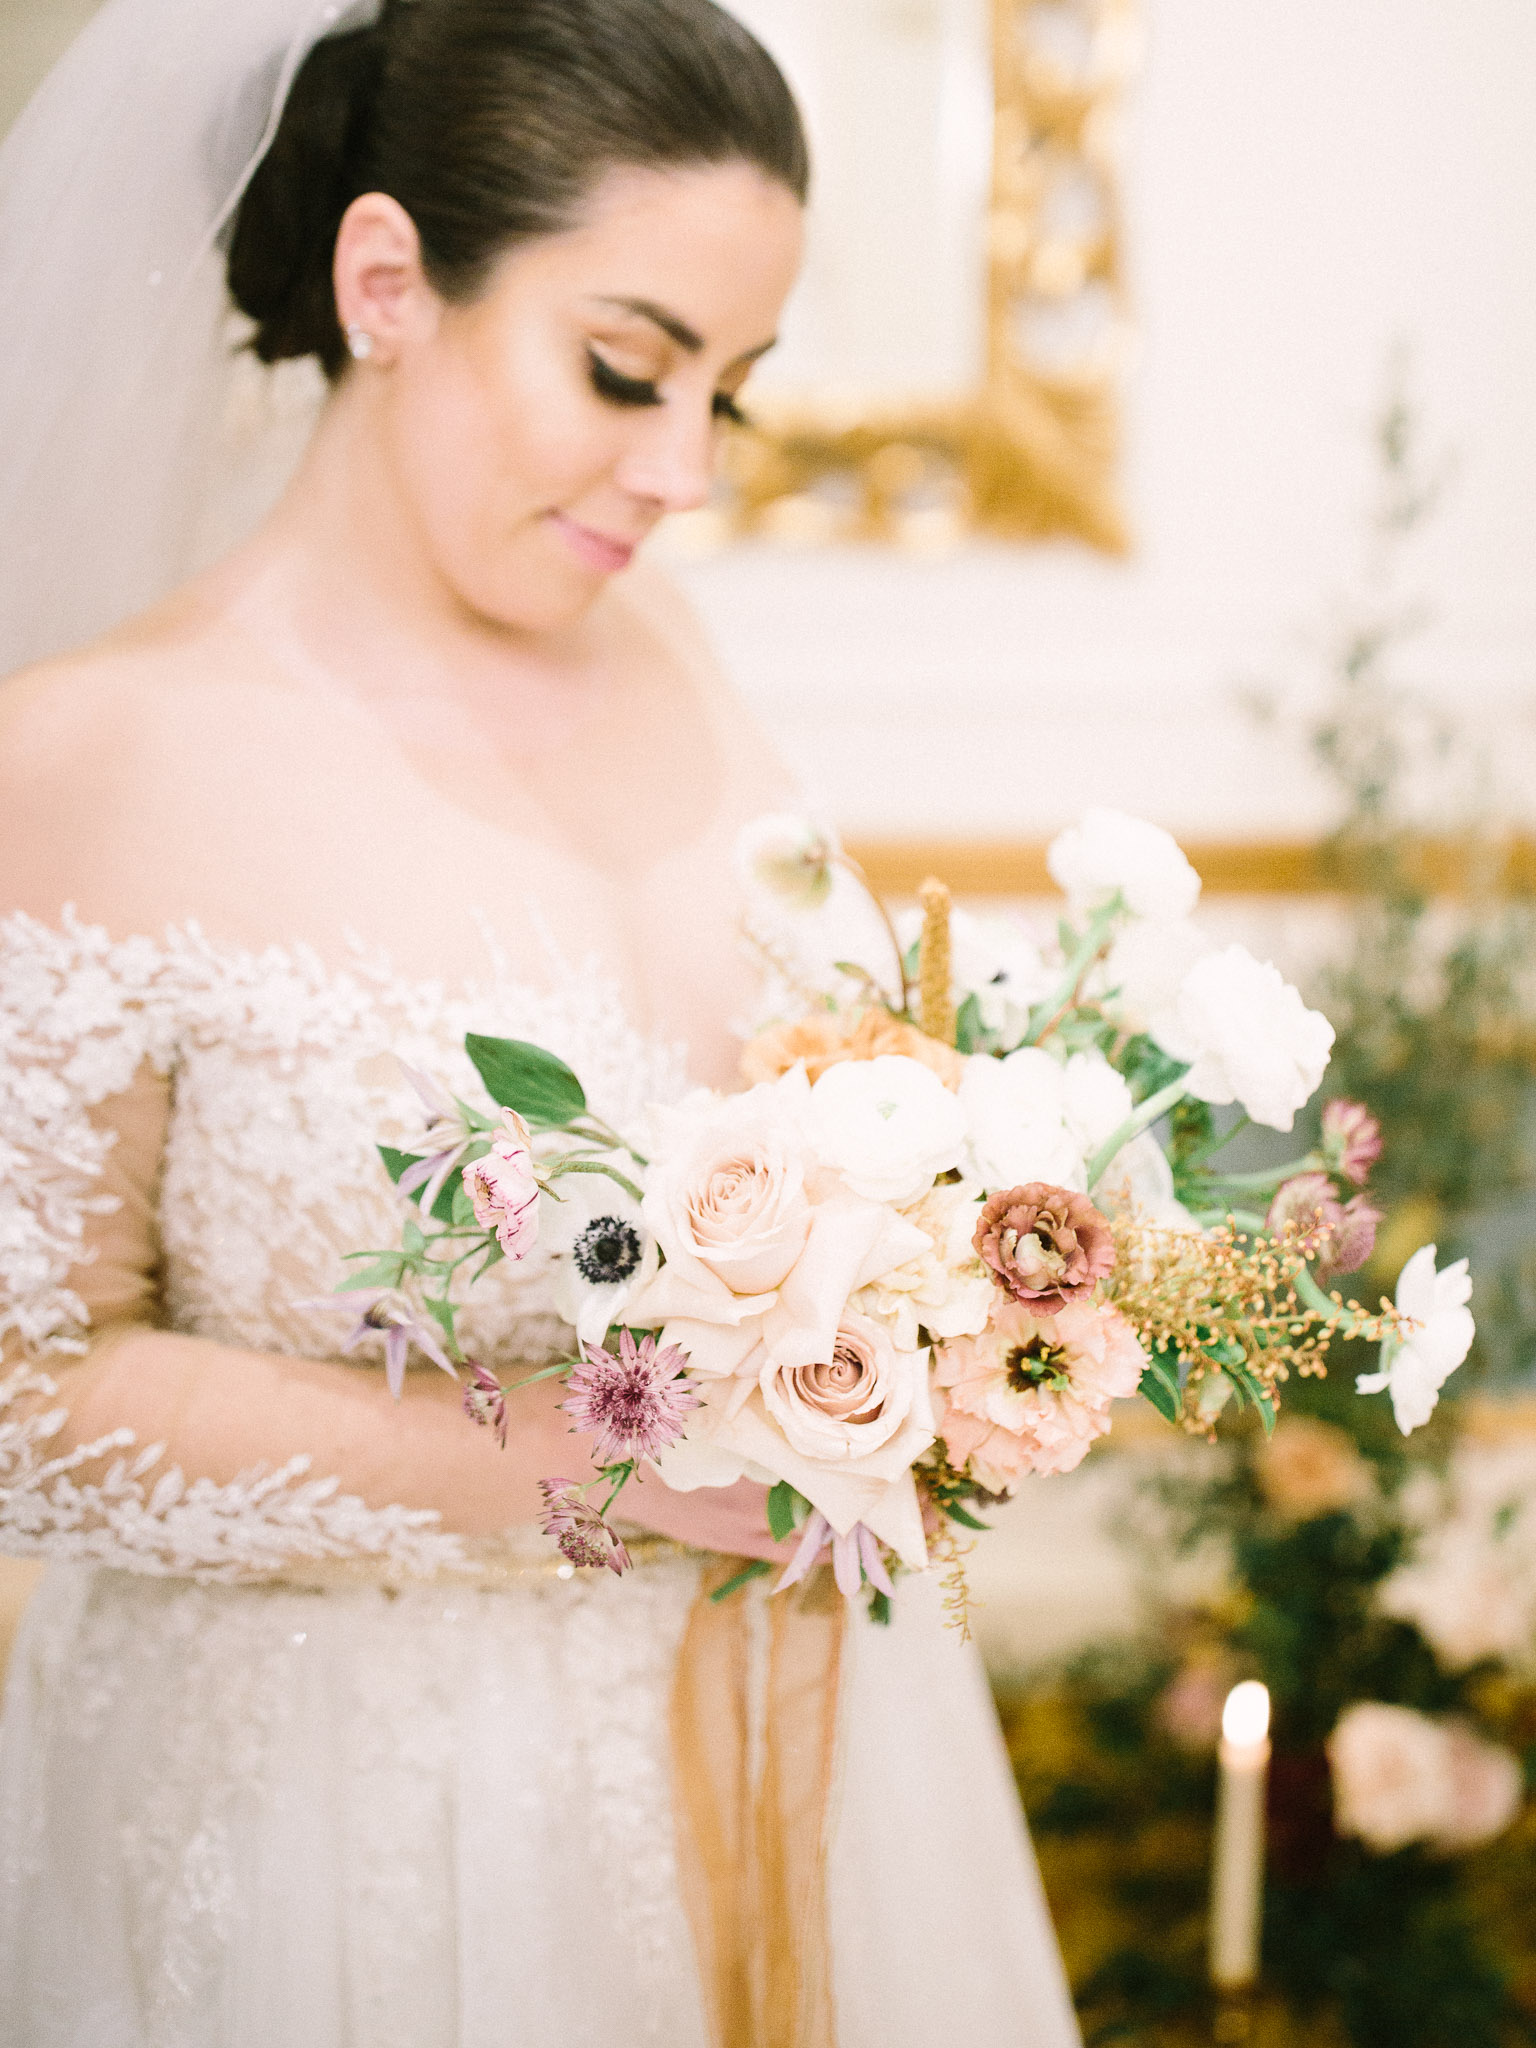 Hanna&Jordan Wedding_HotelVancouver_9395.jpg